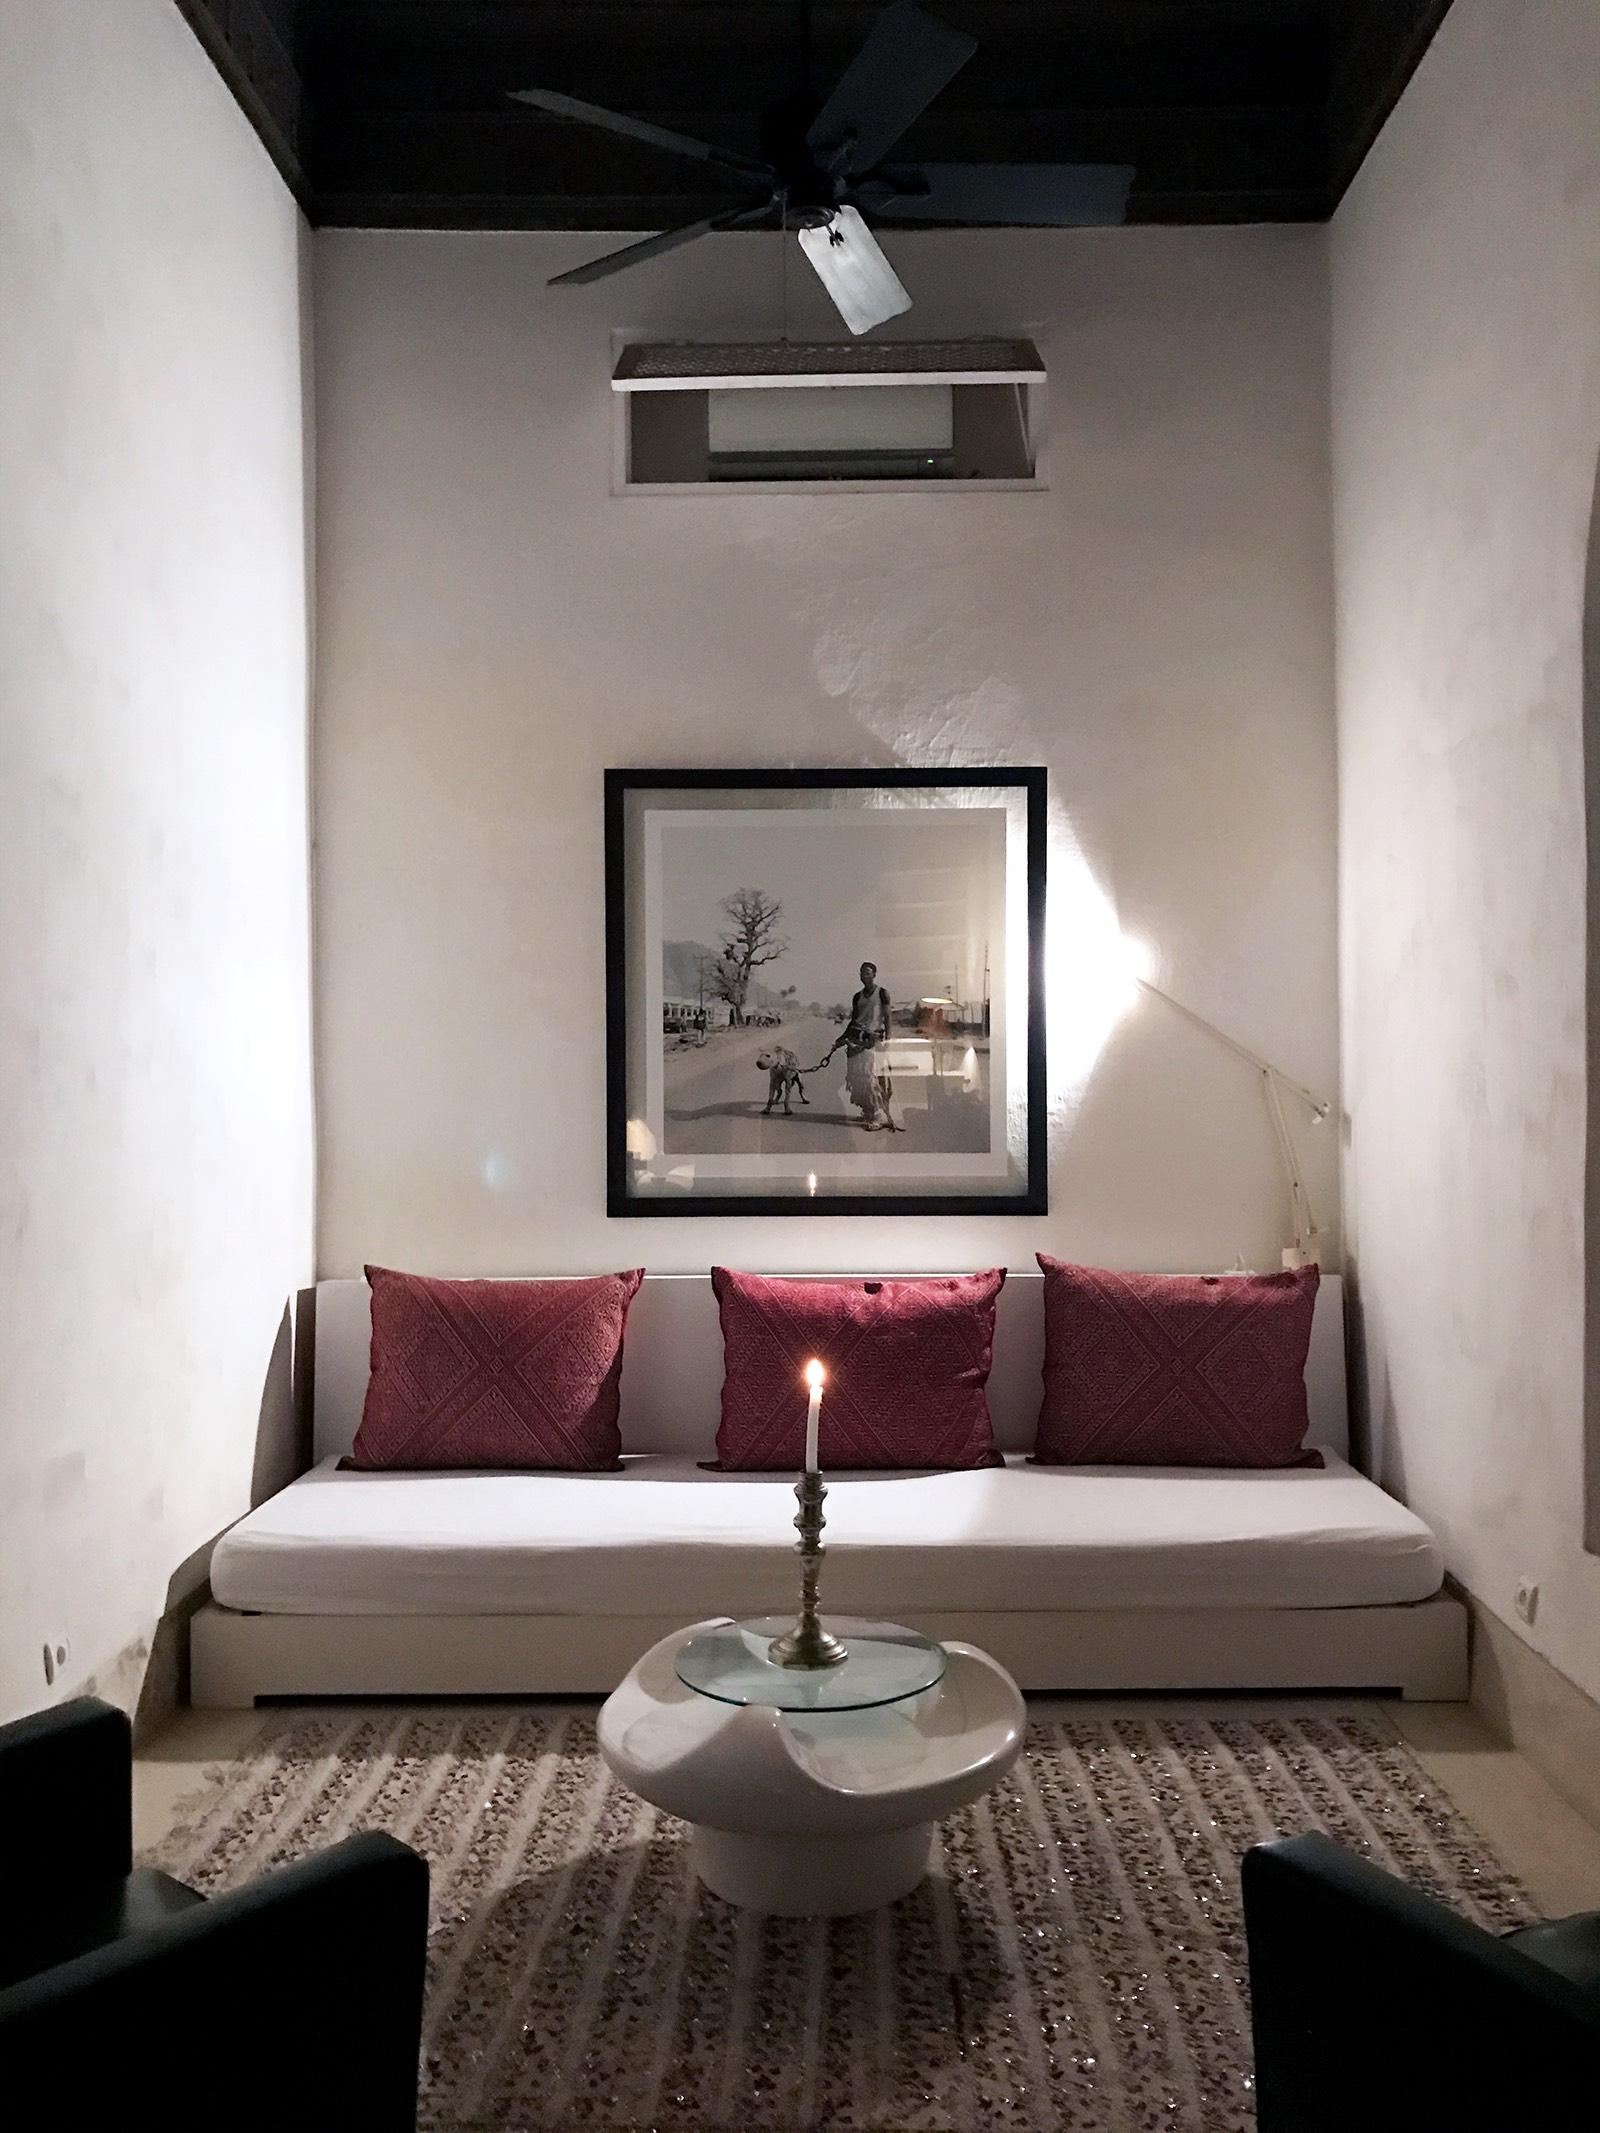 Marrakech-Riad-Be-Mena-living-room-Morocco.jpg